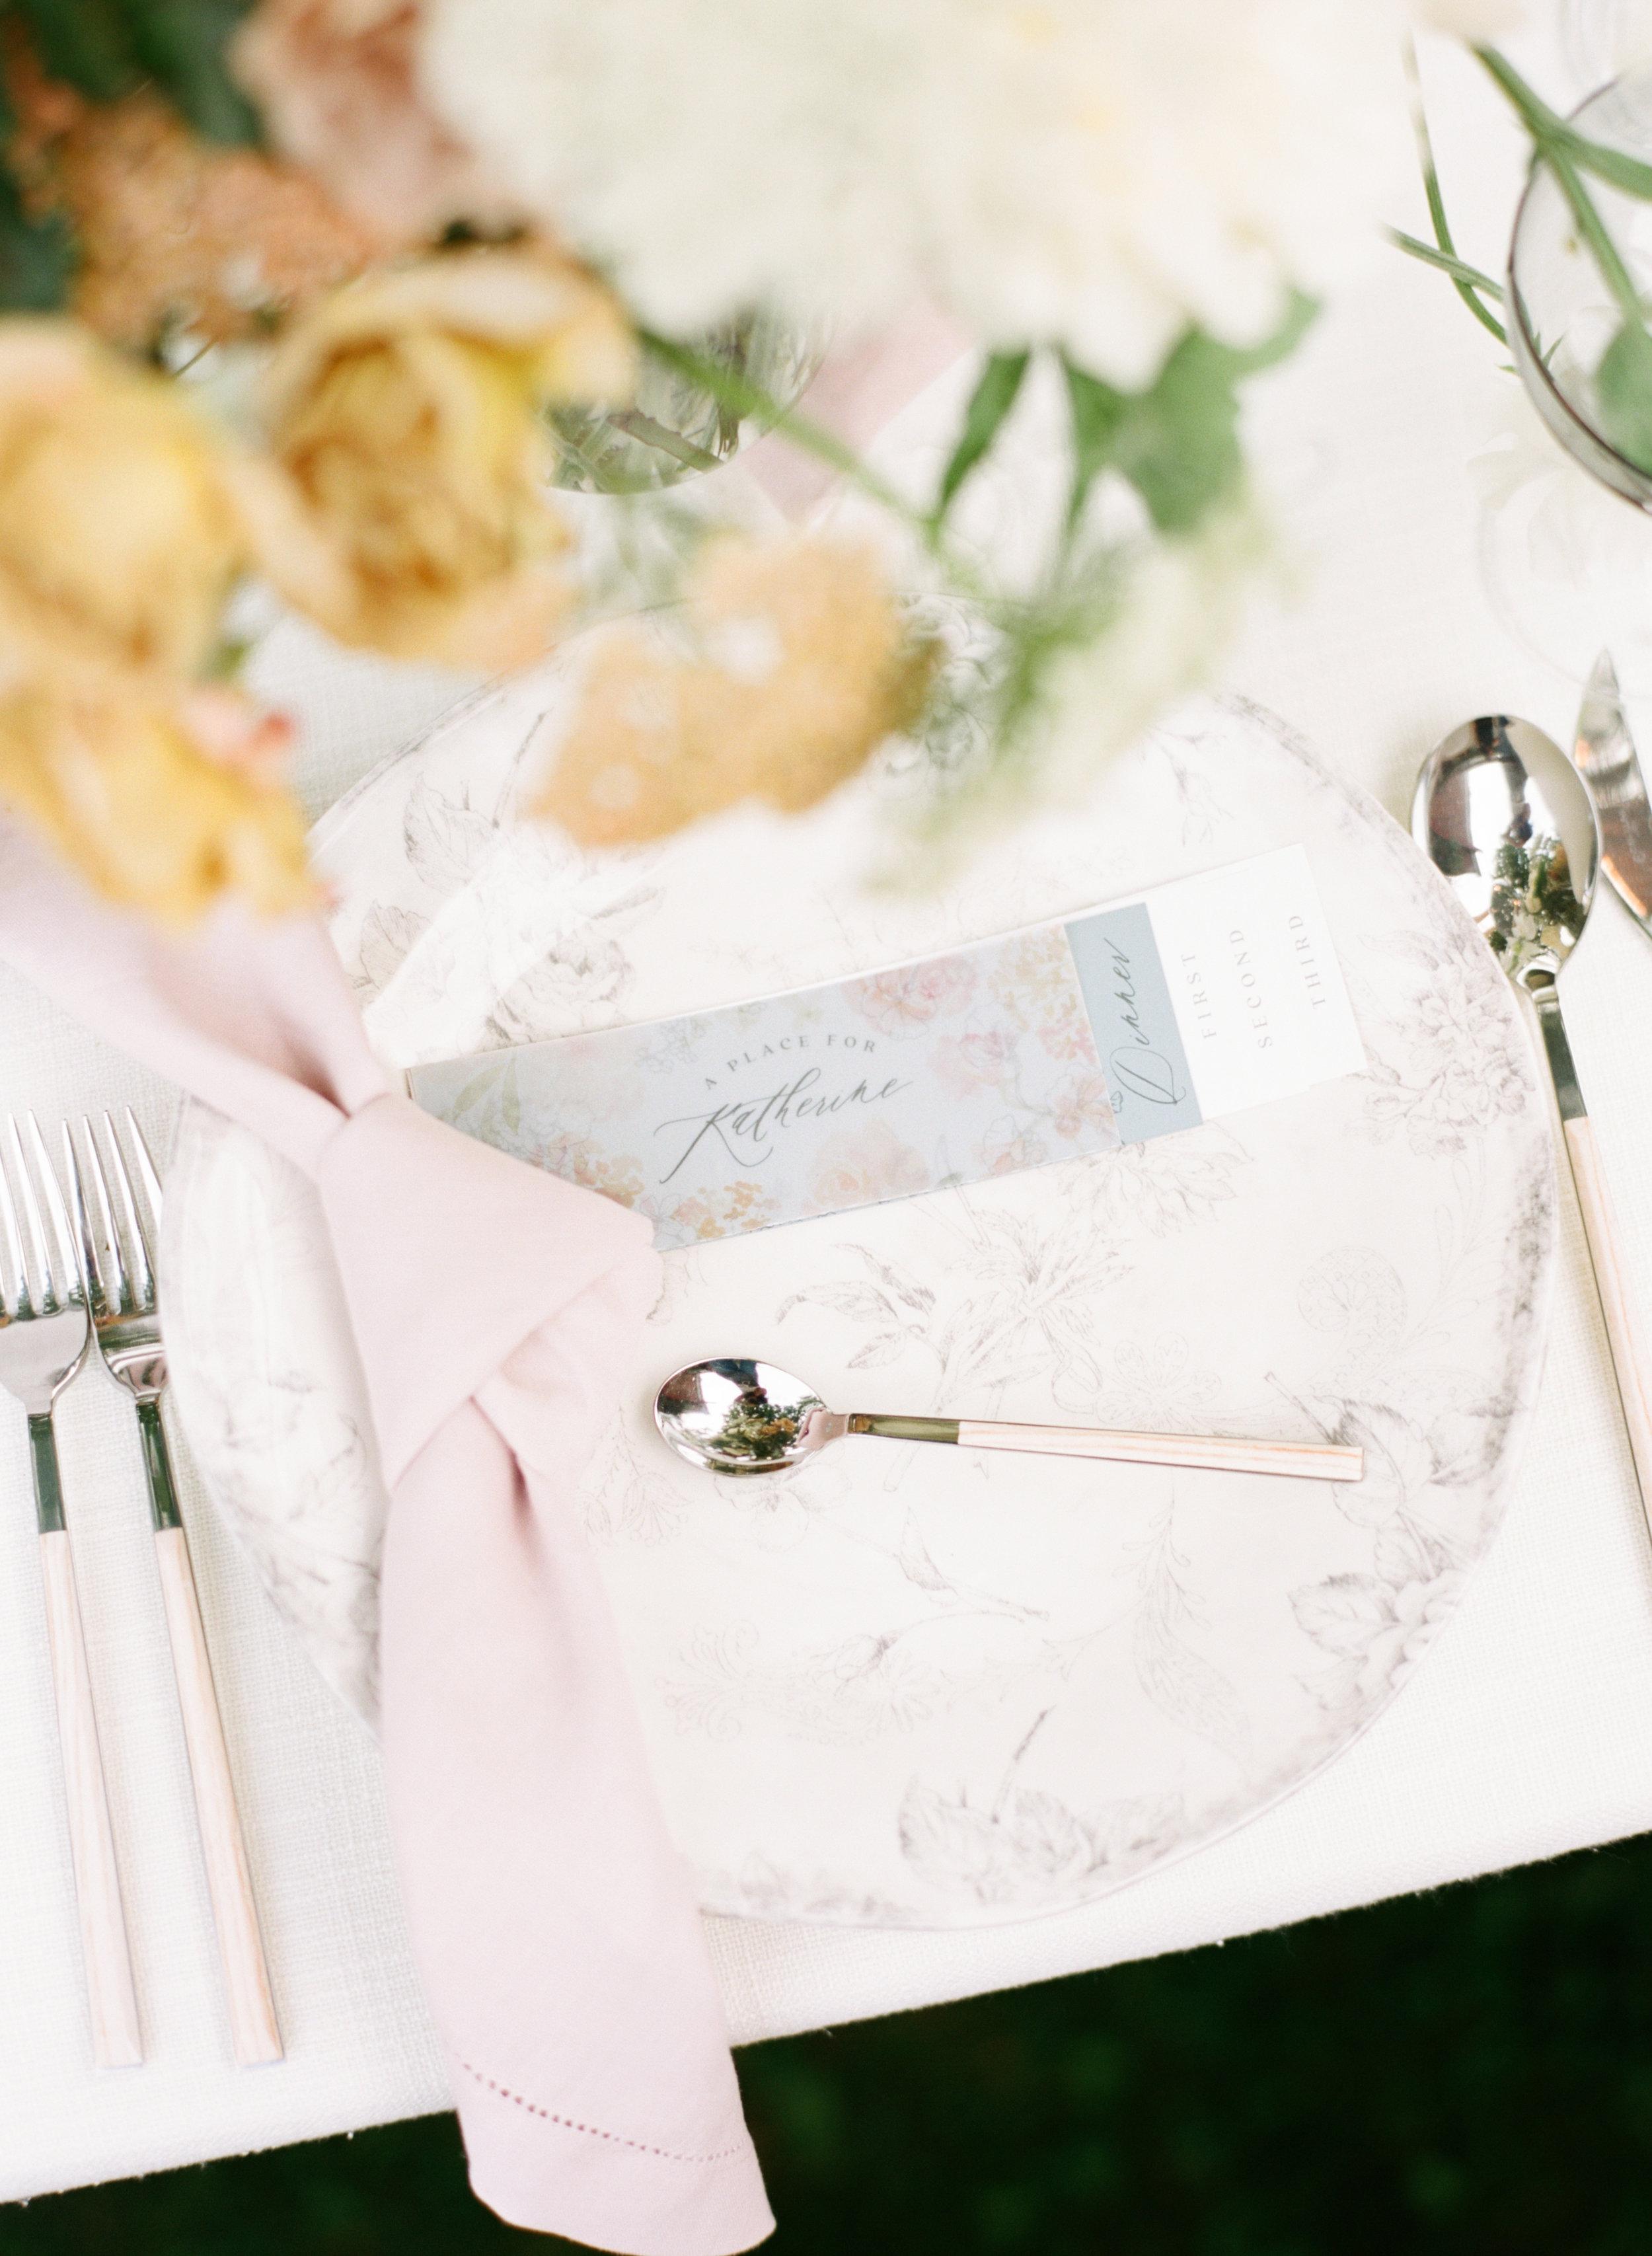 alexandra-meseke-understated-soft-luxury-wedding-upstate-ny_0134.jpg